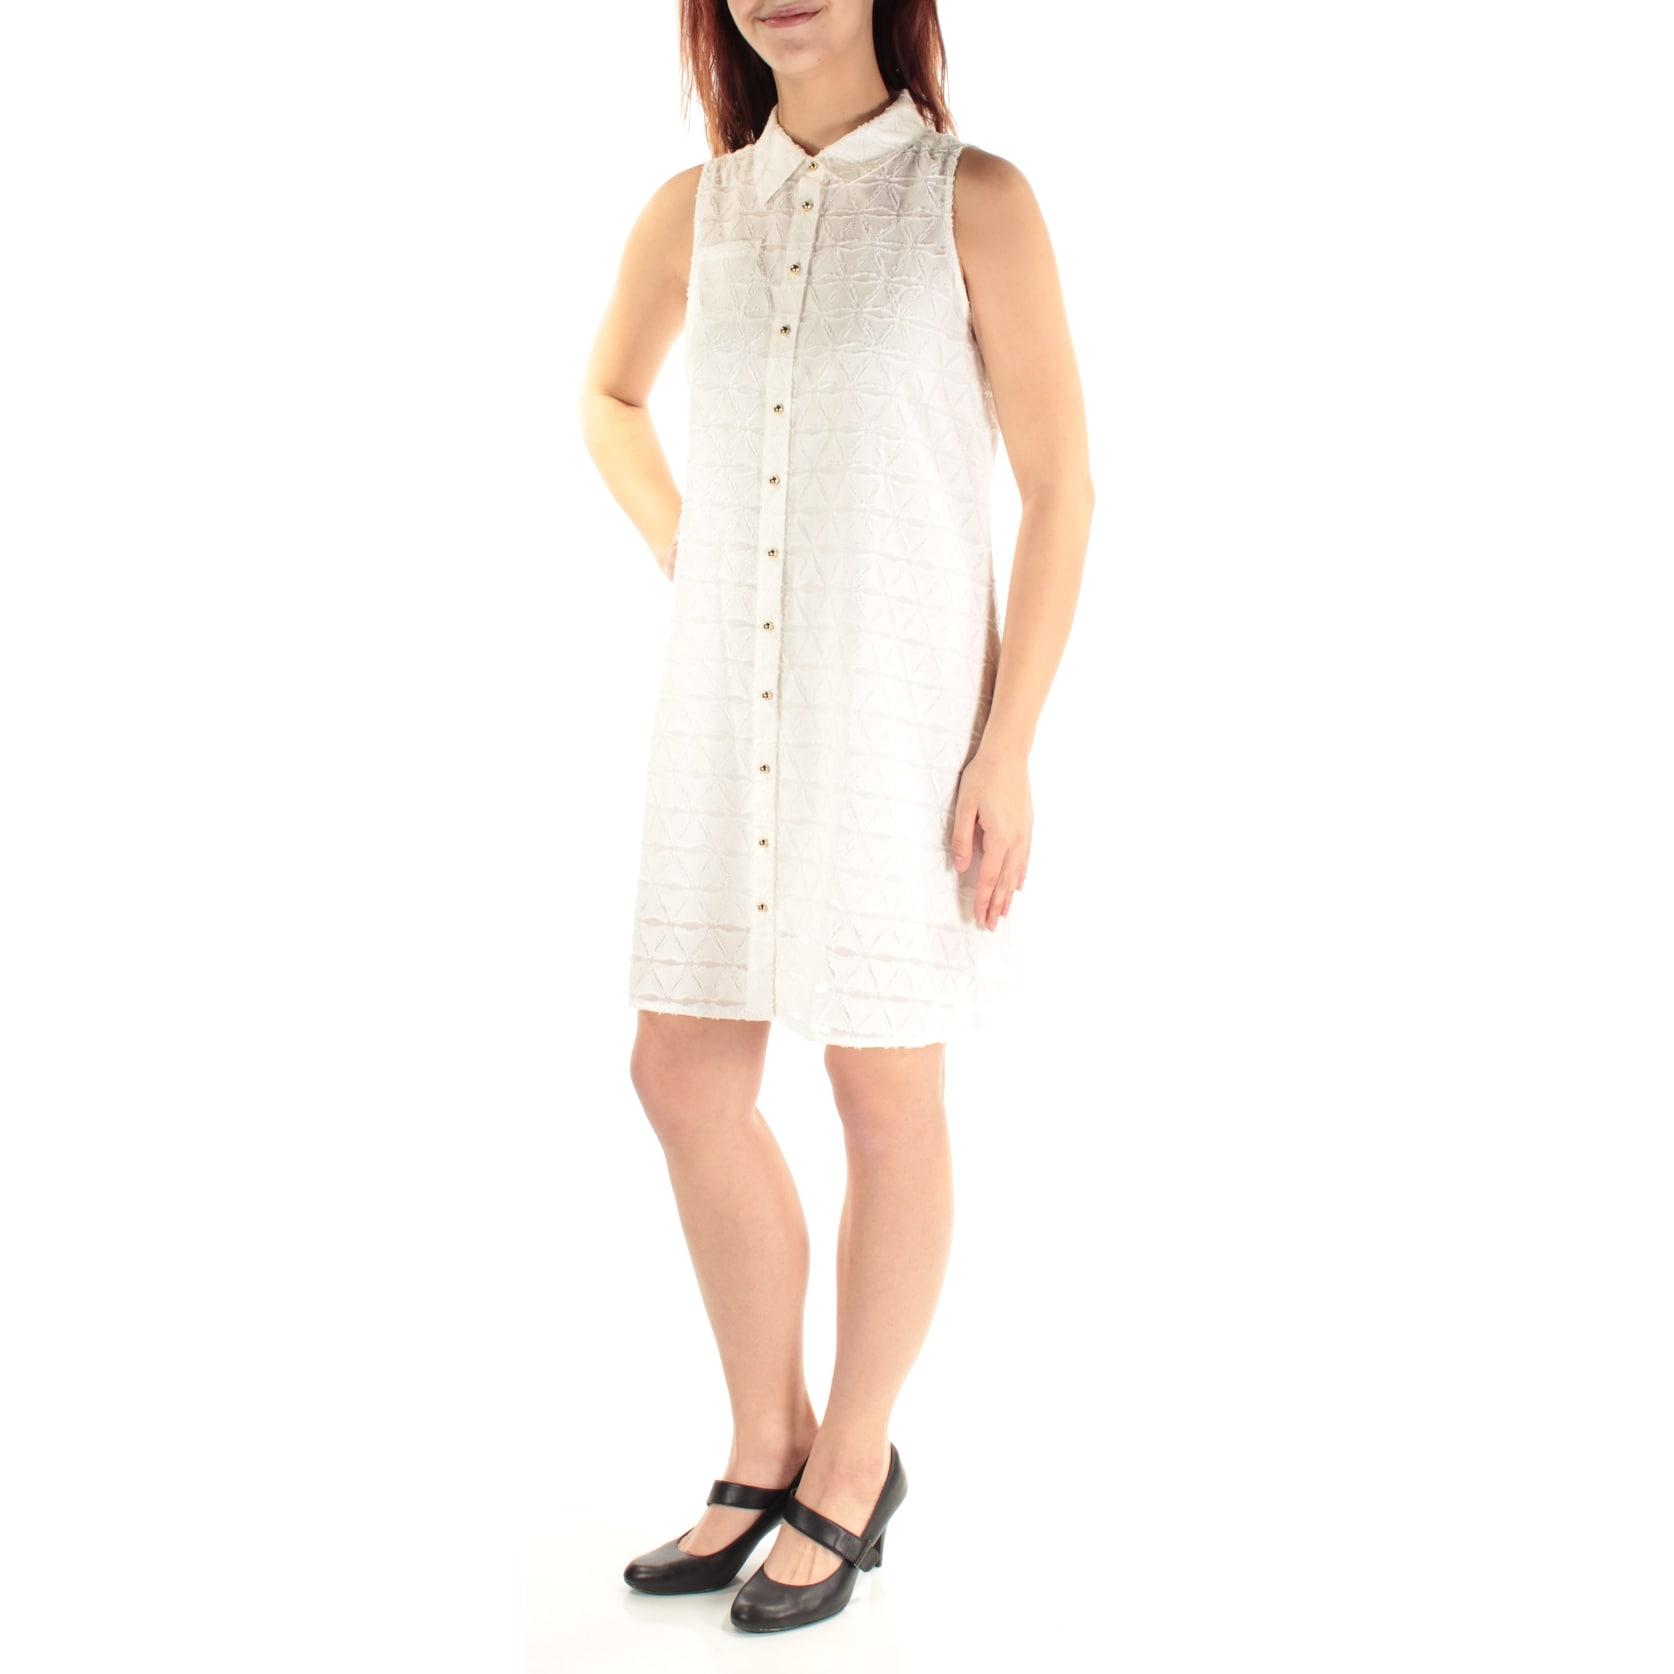 Shop Calvin Klein Womens White Textured Sleeveless Collared Above